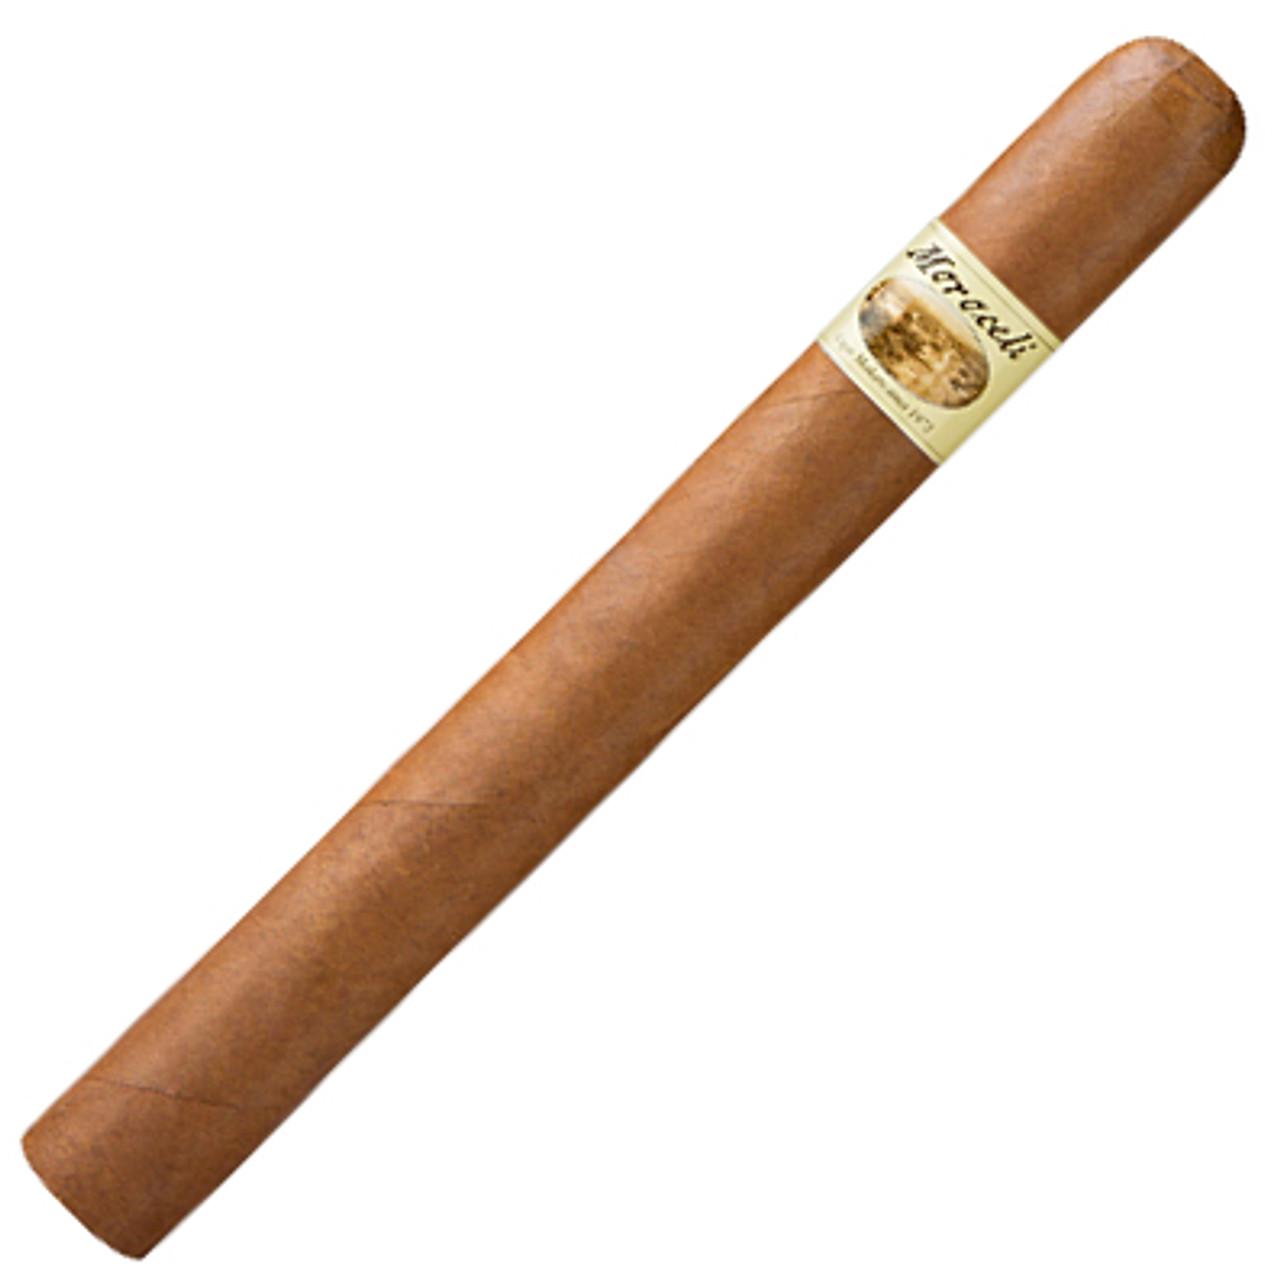 Moroceli Churchill Cigars - 7 x 50 (Bundle of 20)